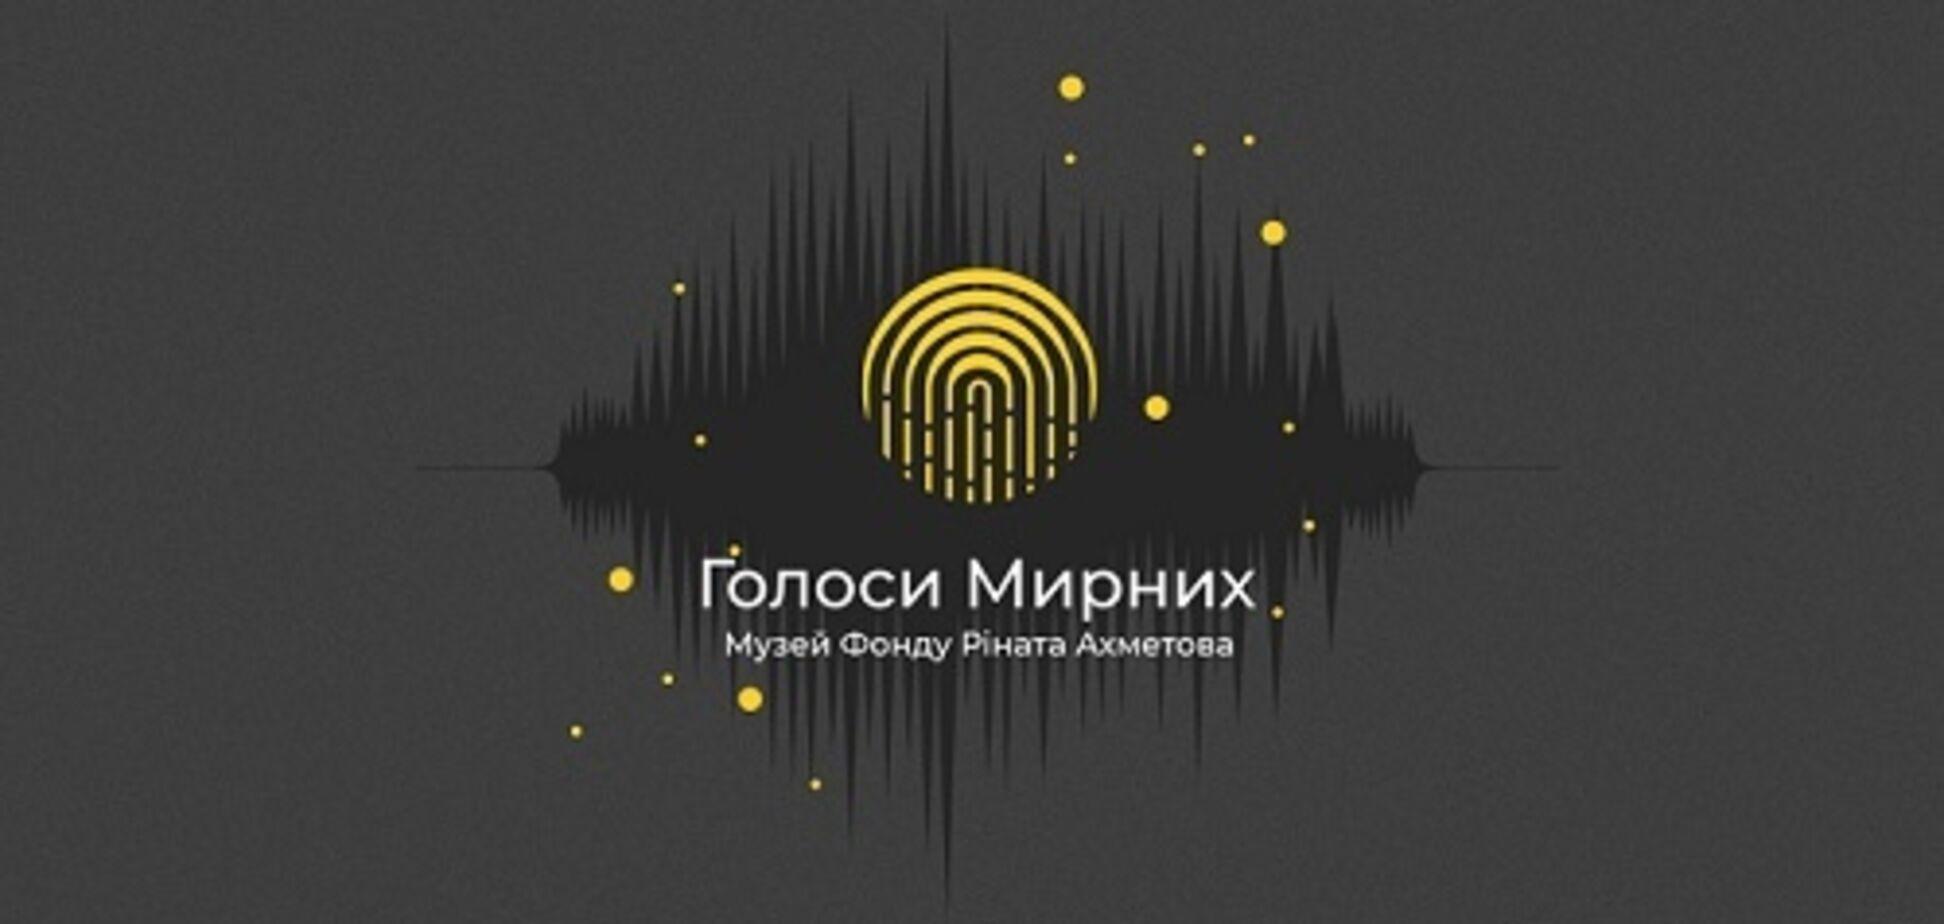 ДТЕК приєднався до проєкту 'Голоси Мирних' Фонду Ріната Ахметова